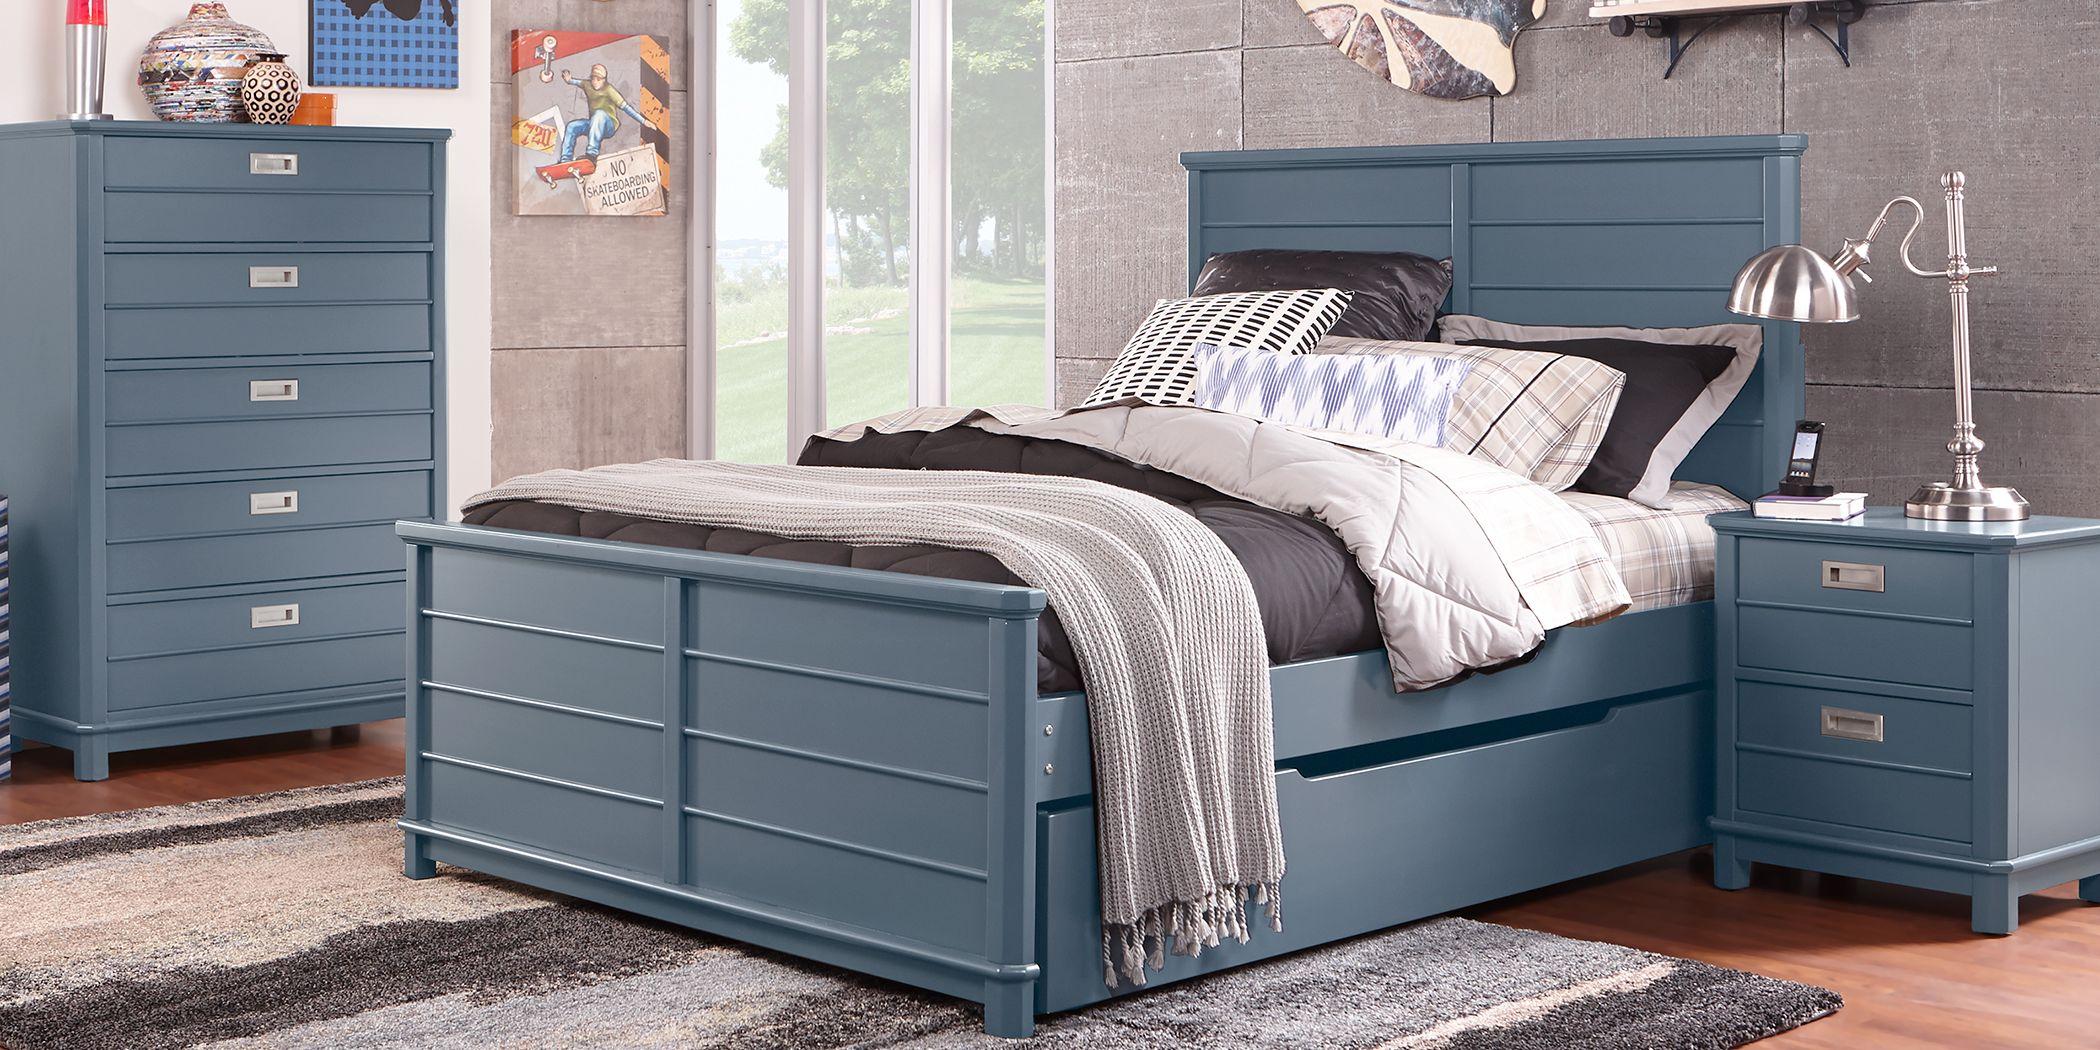 Kids Bedroom Set Kids Bedroom Furniture